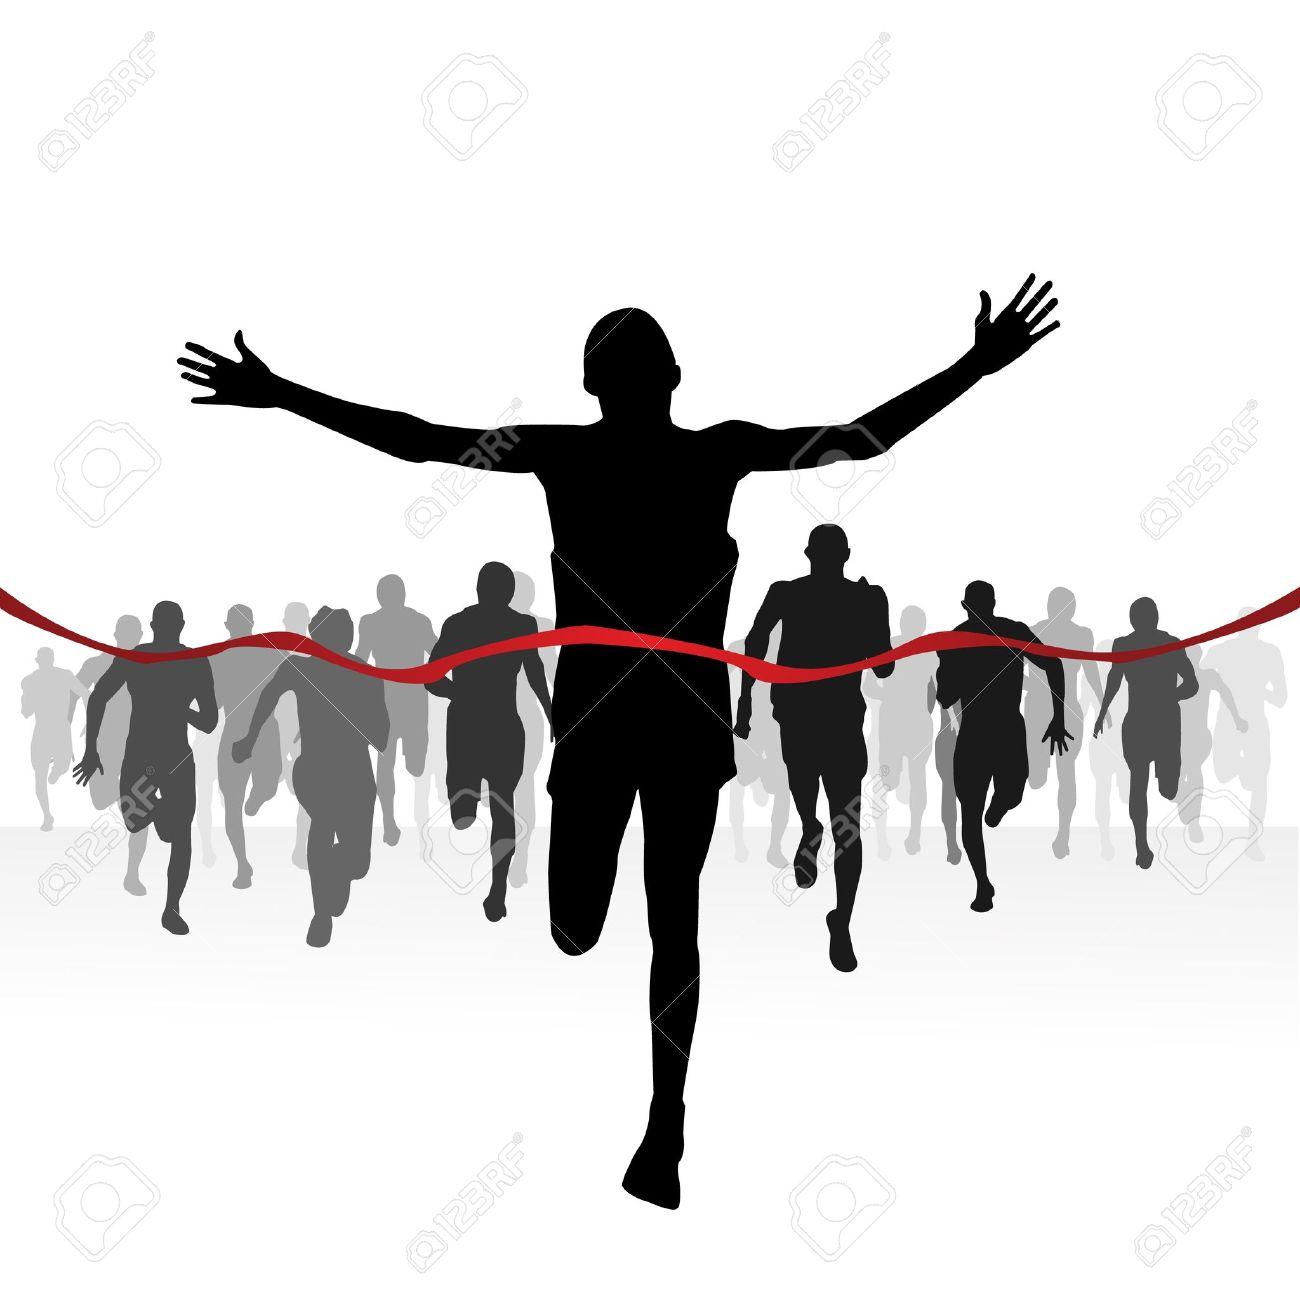 finish line race  Marathon  Race Clipart Finish Line